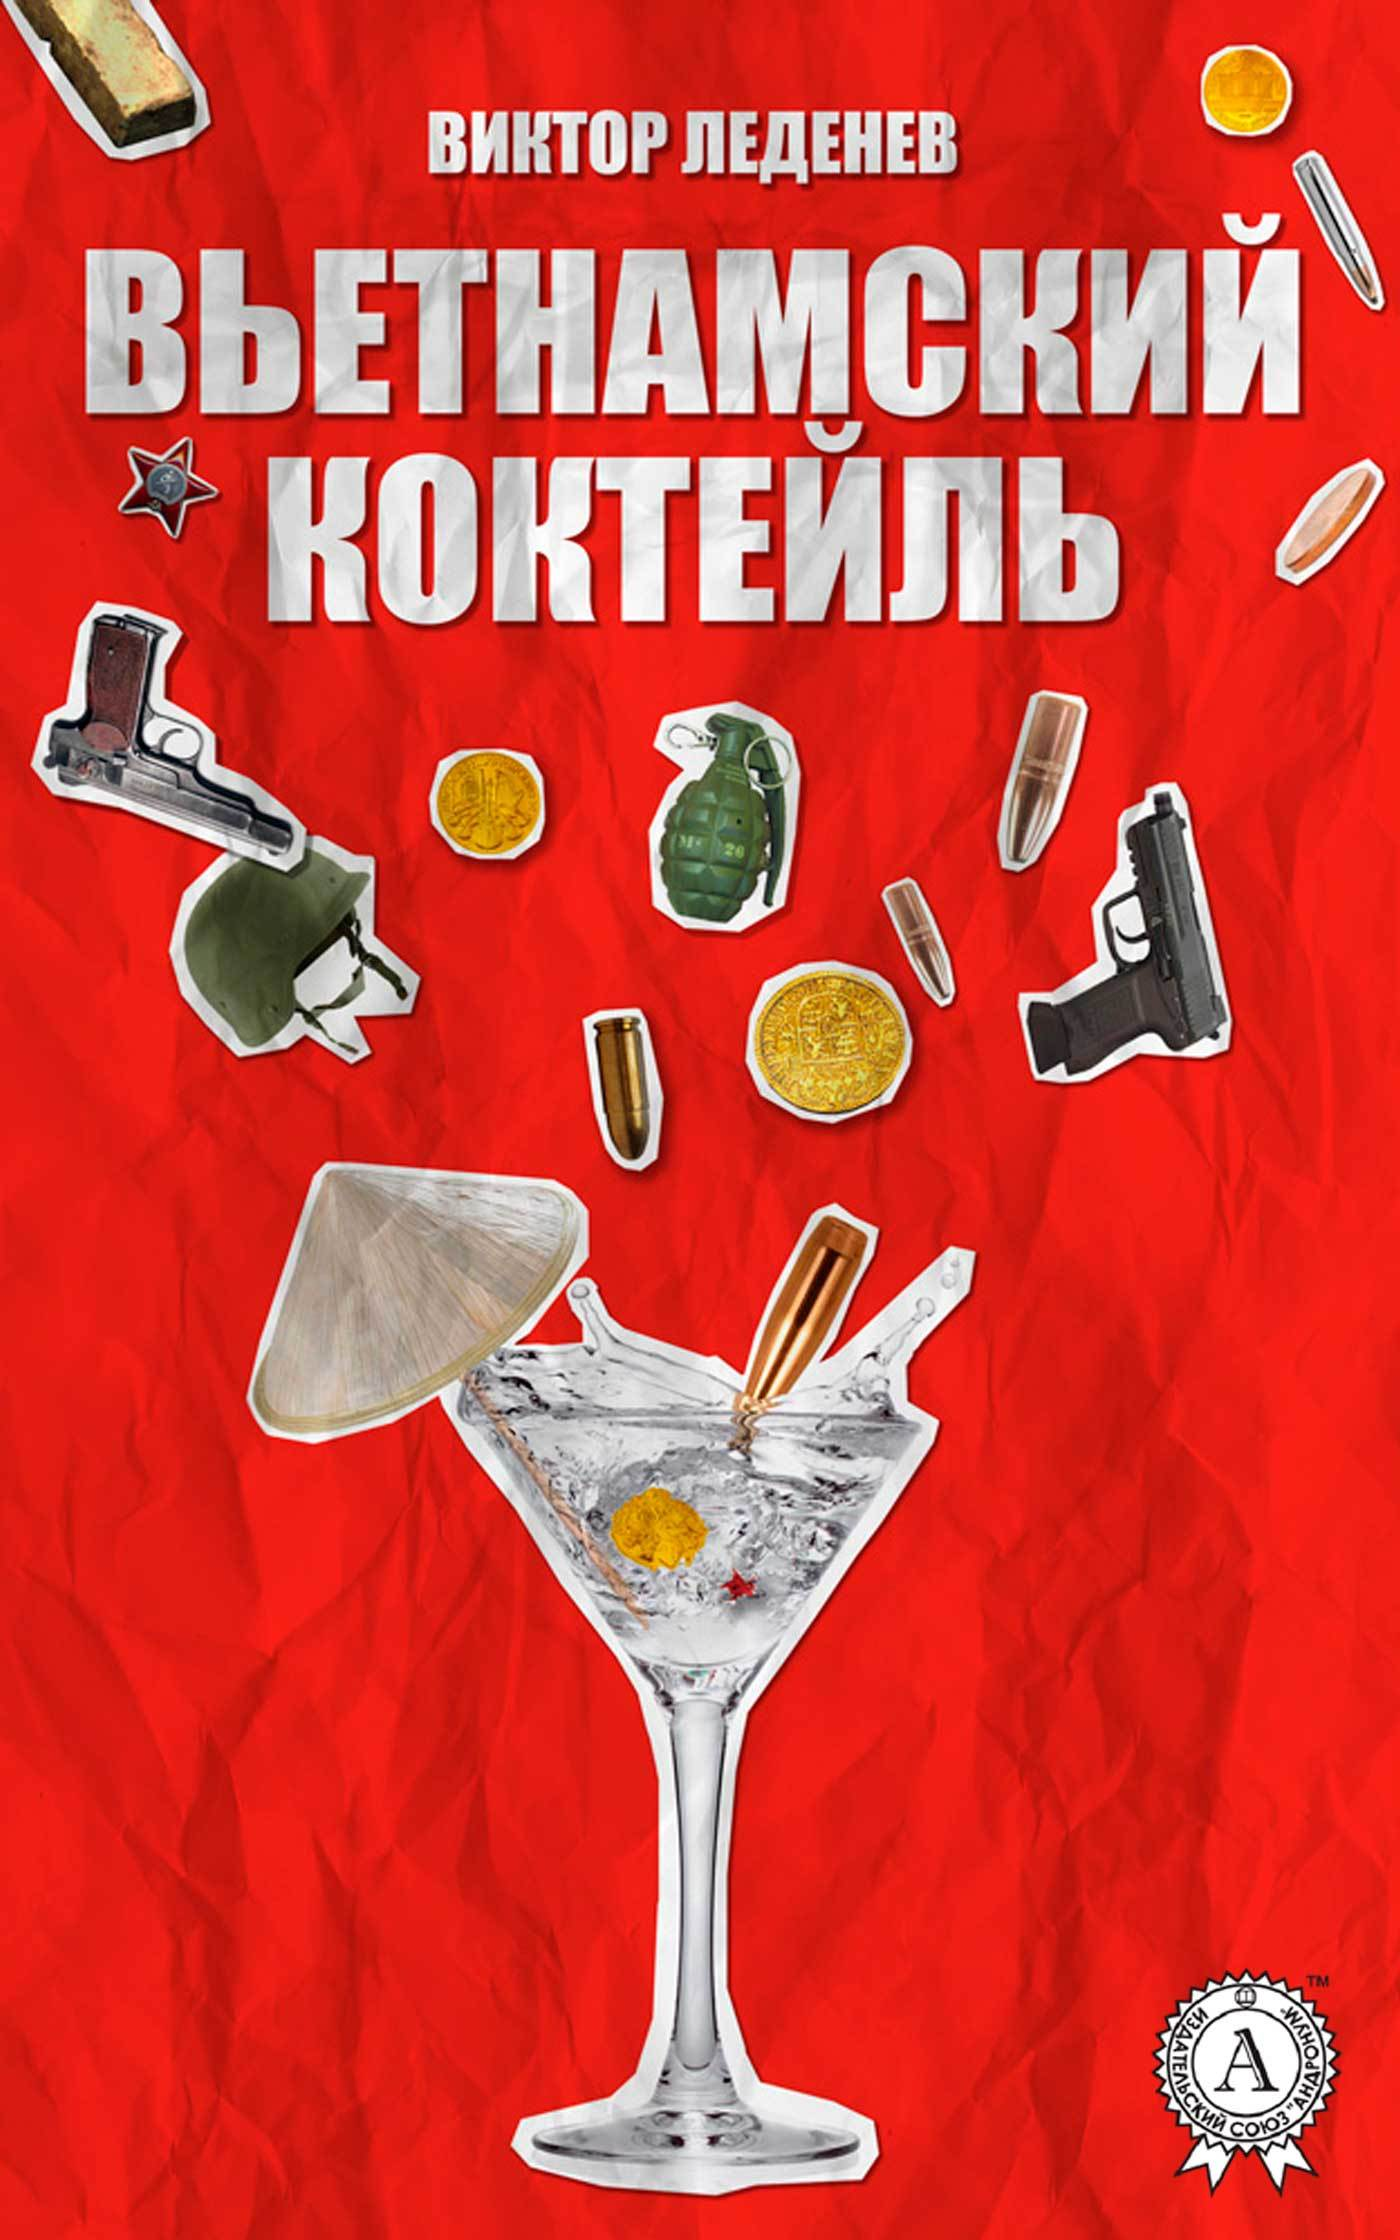 Виктор Леденев «Вьетнамский коктейль»